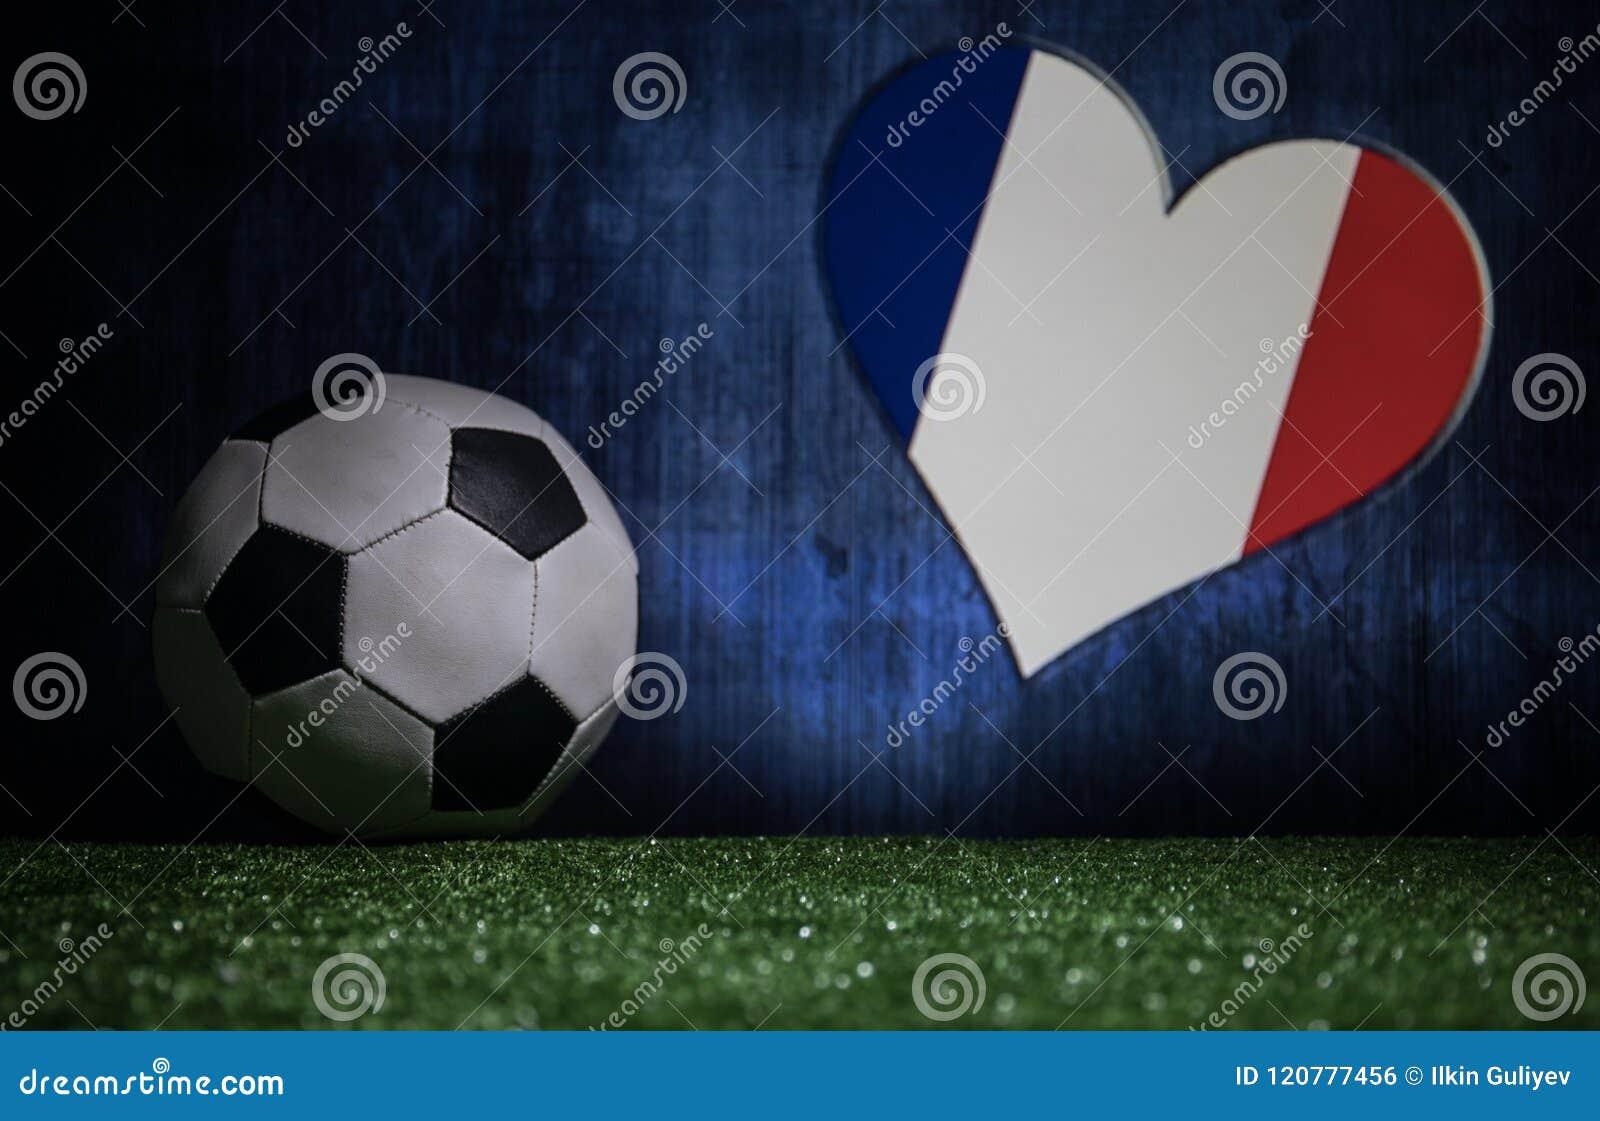 Soccer 2018. Creative concept. Soccer ball on green grass. Support France team concept.